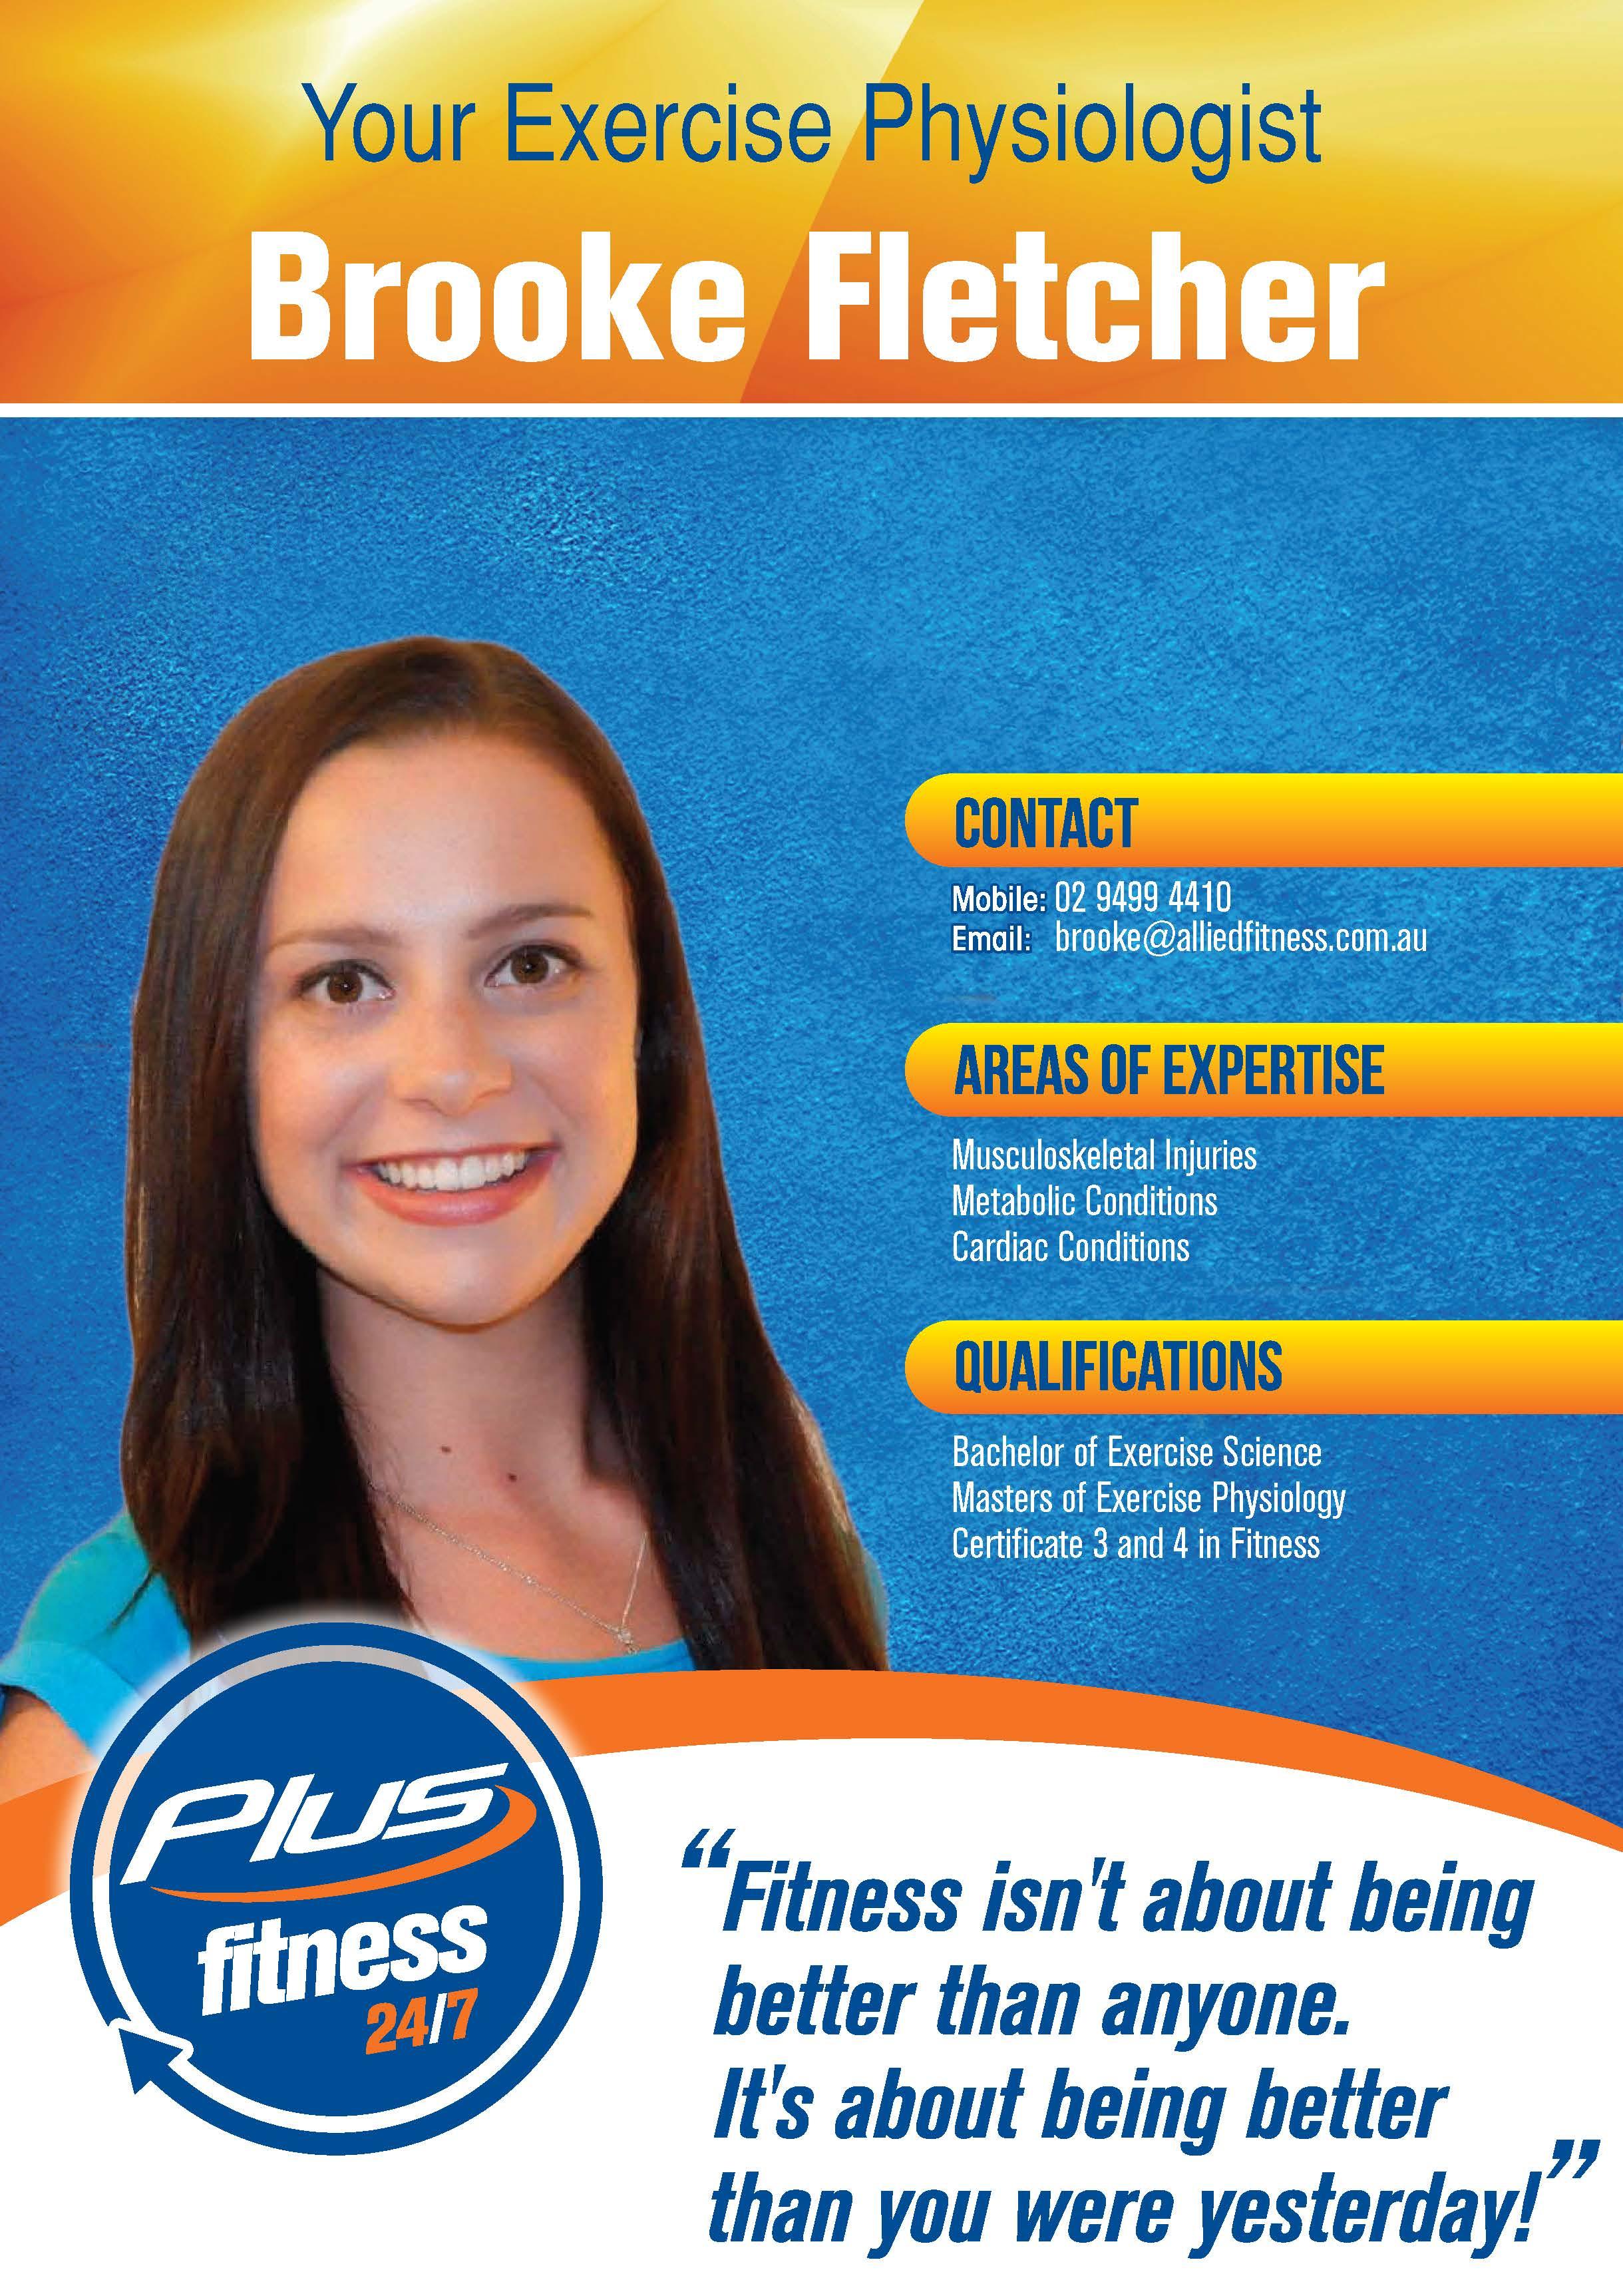 Brooke Fletcher